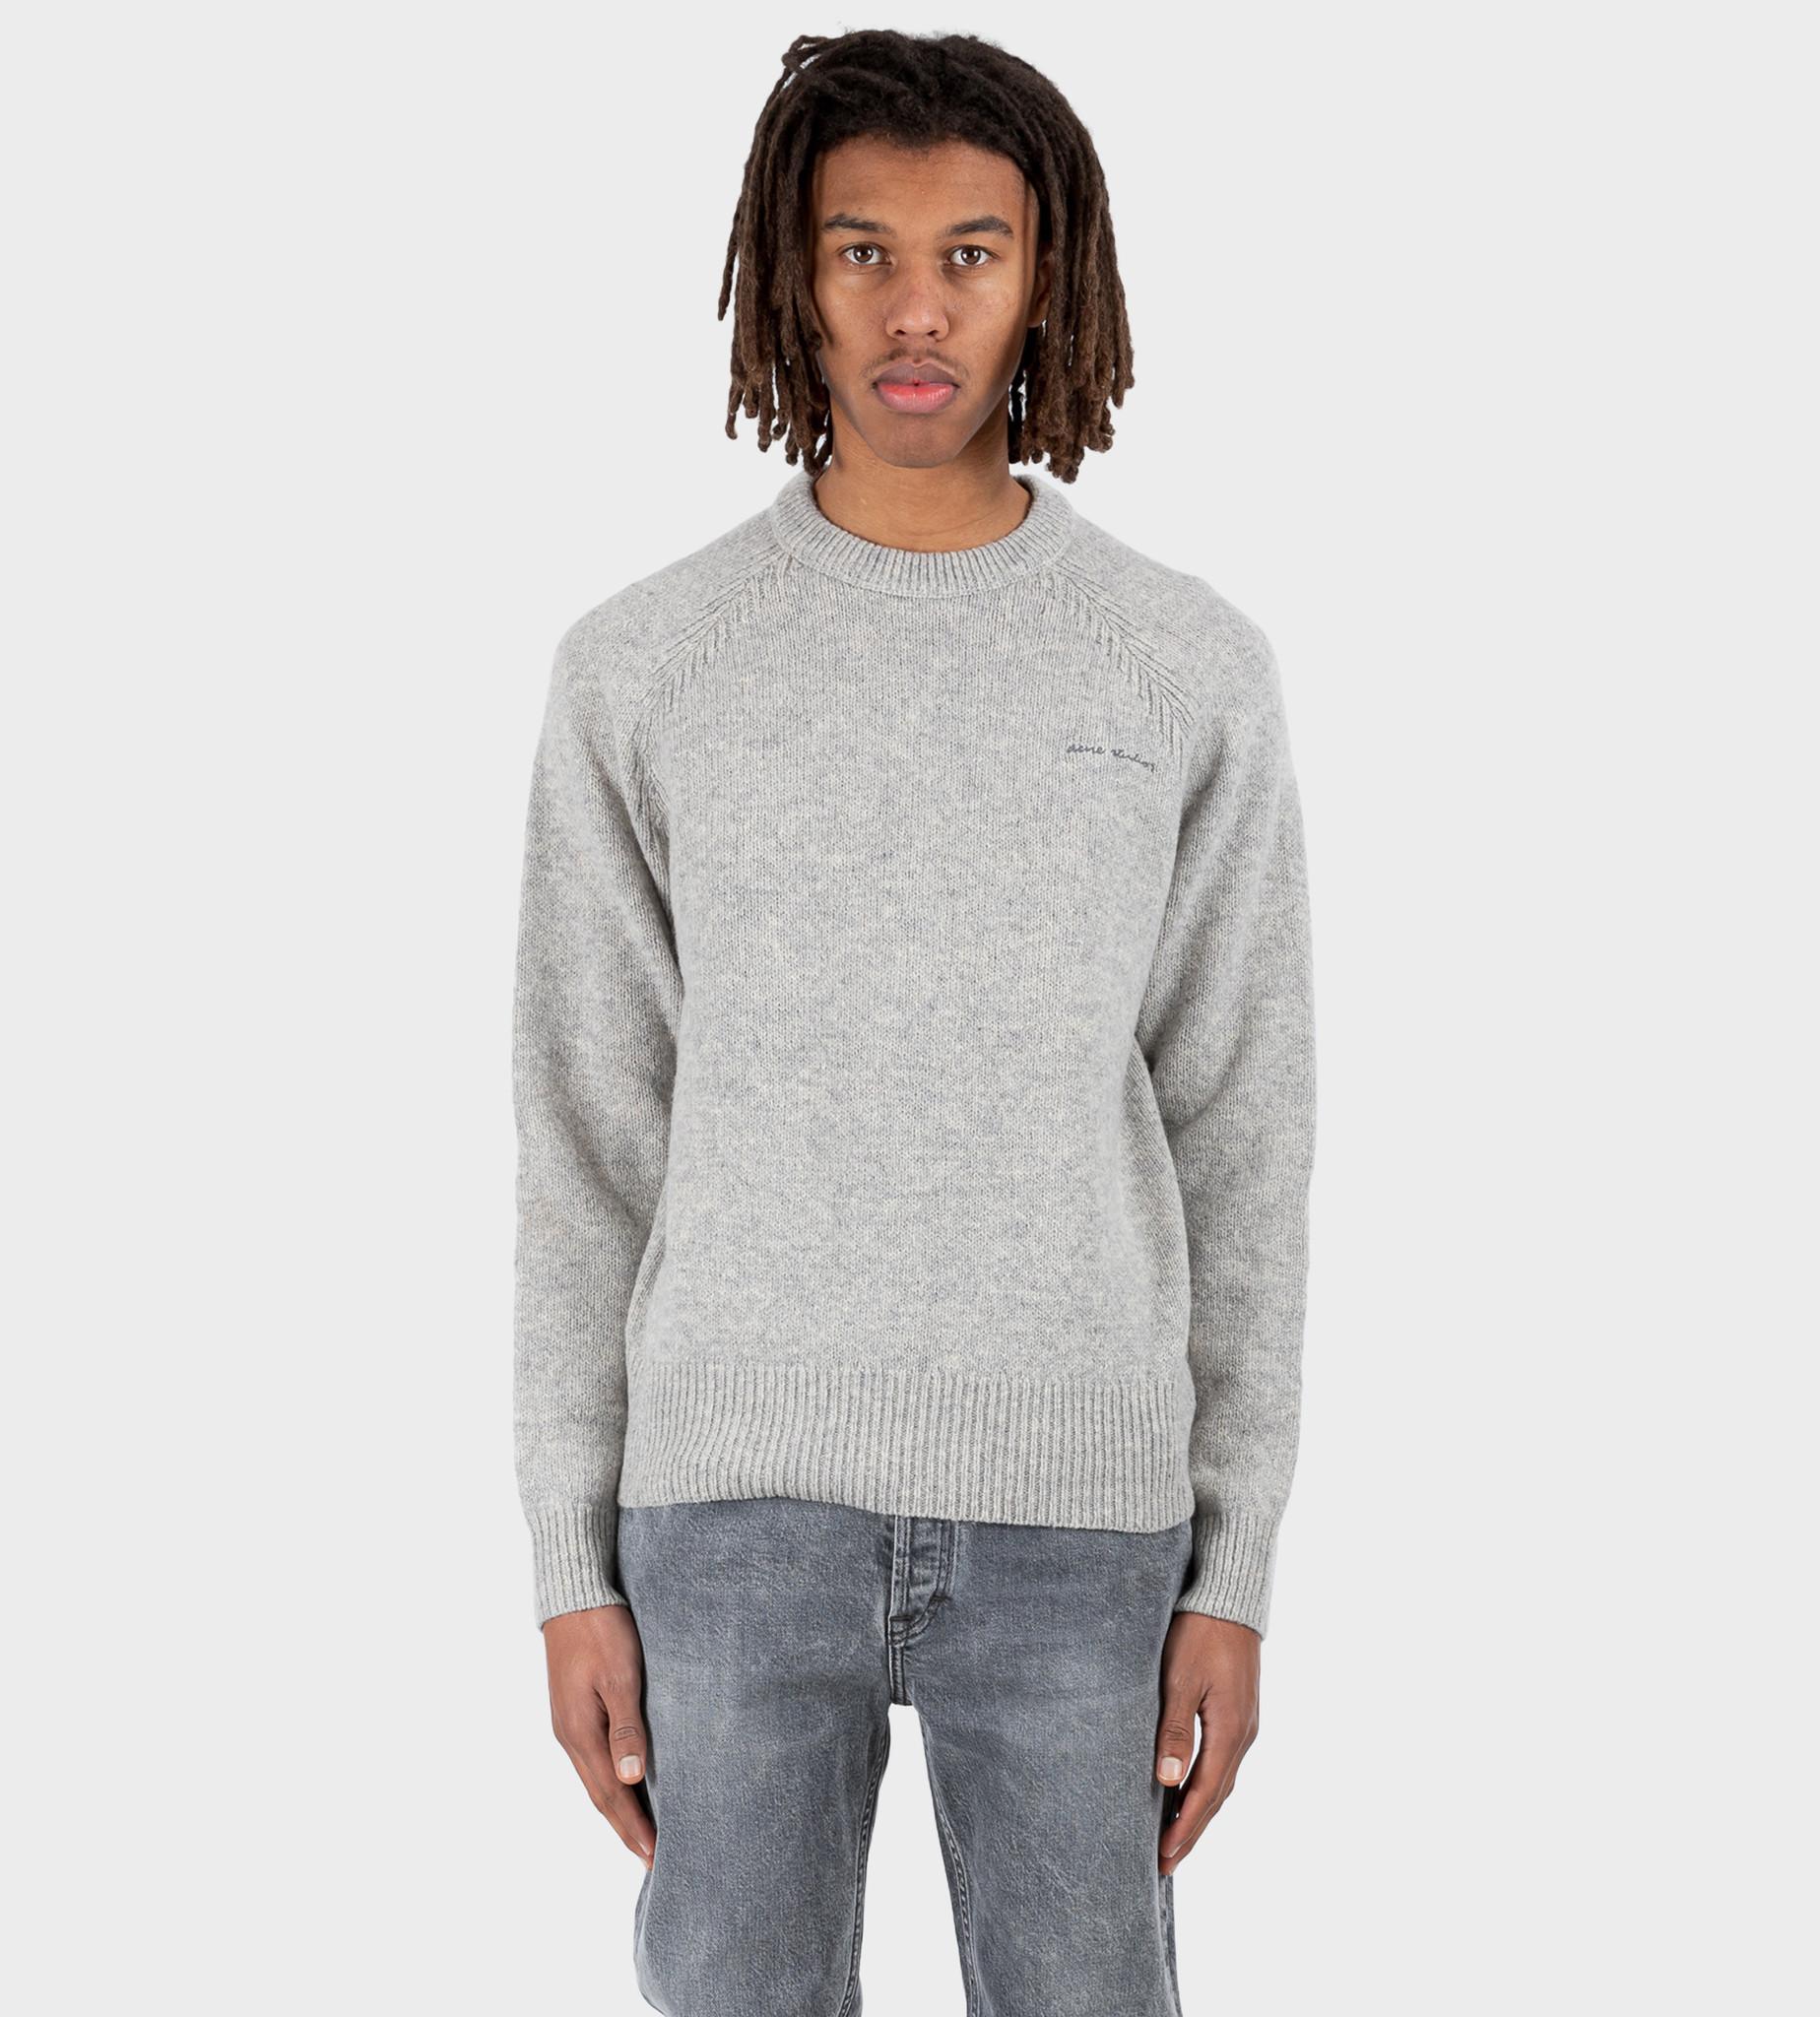 ACNE STUDIOS Crew Neck Sweater Light Grey Melange